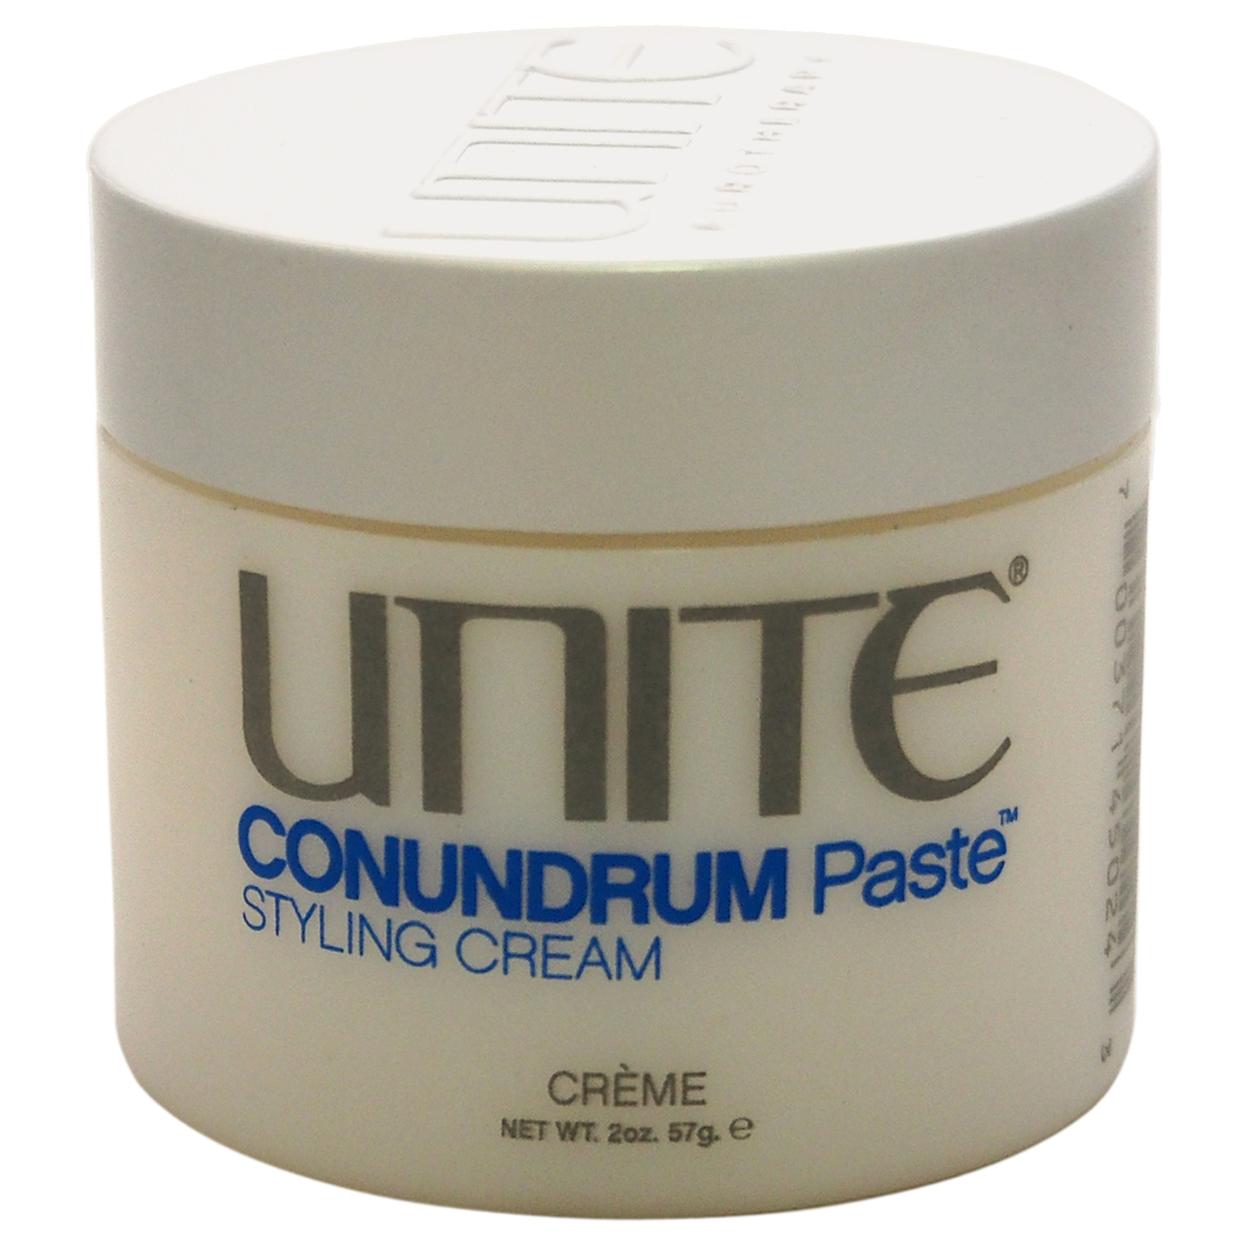 Conundrum Paste Styling Cream By Unite For Unisex 2 Oz Cream